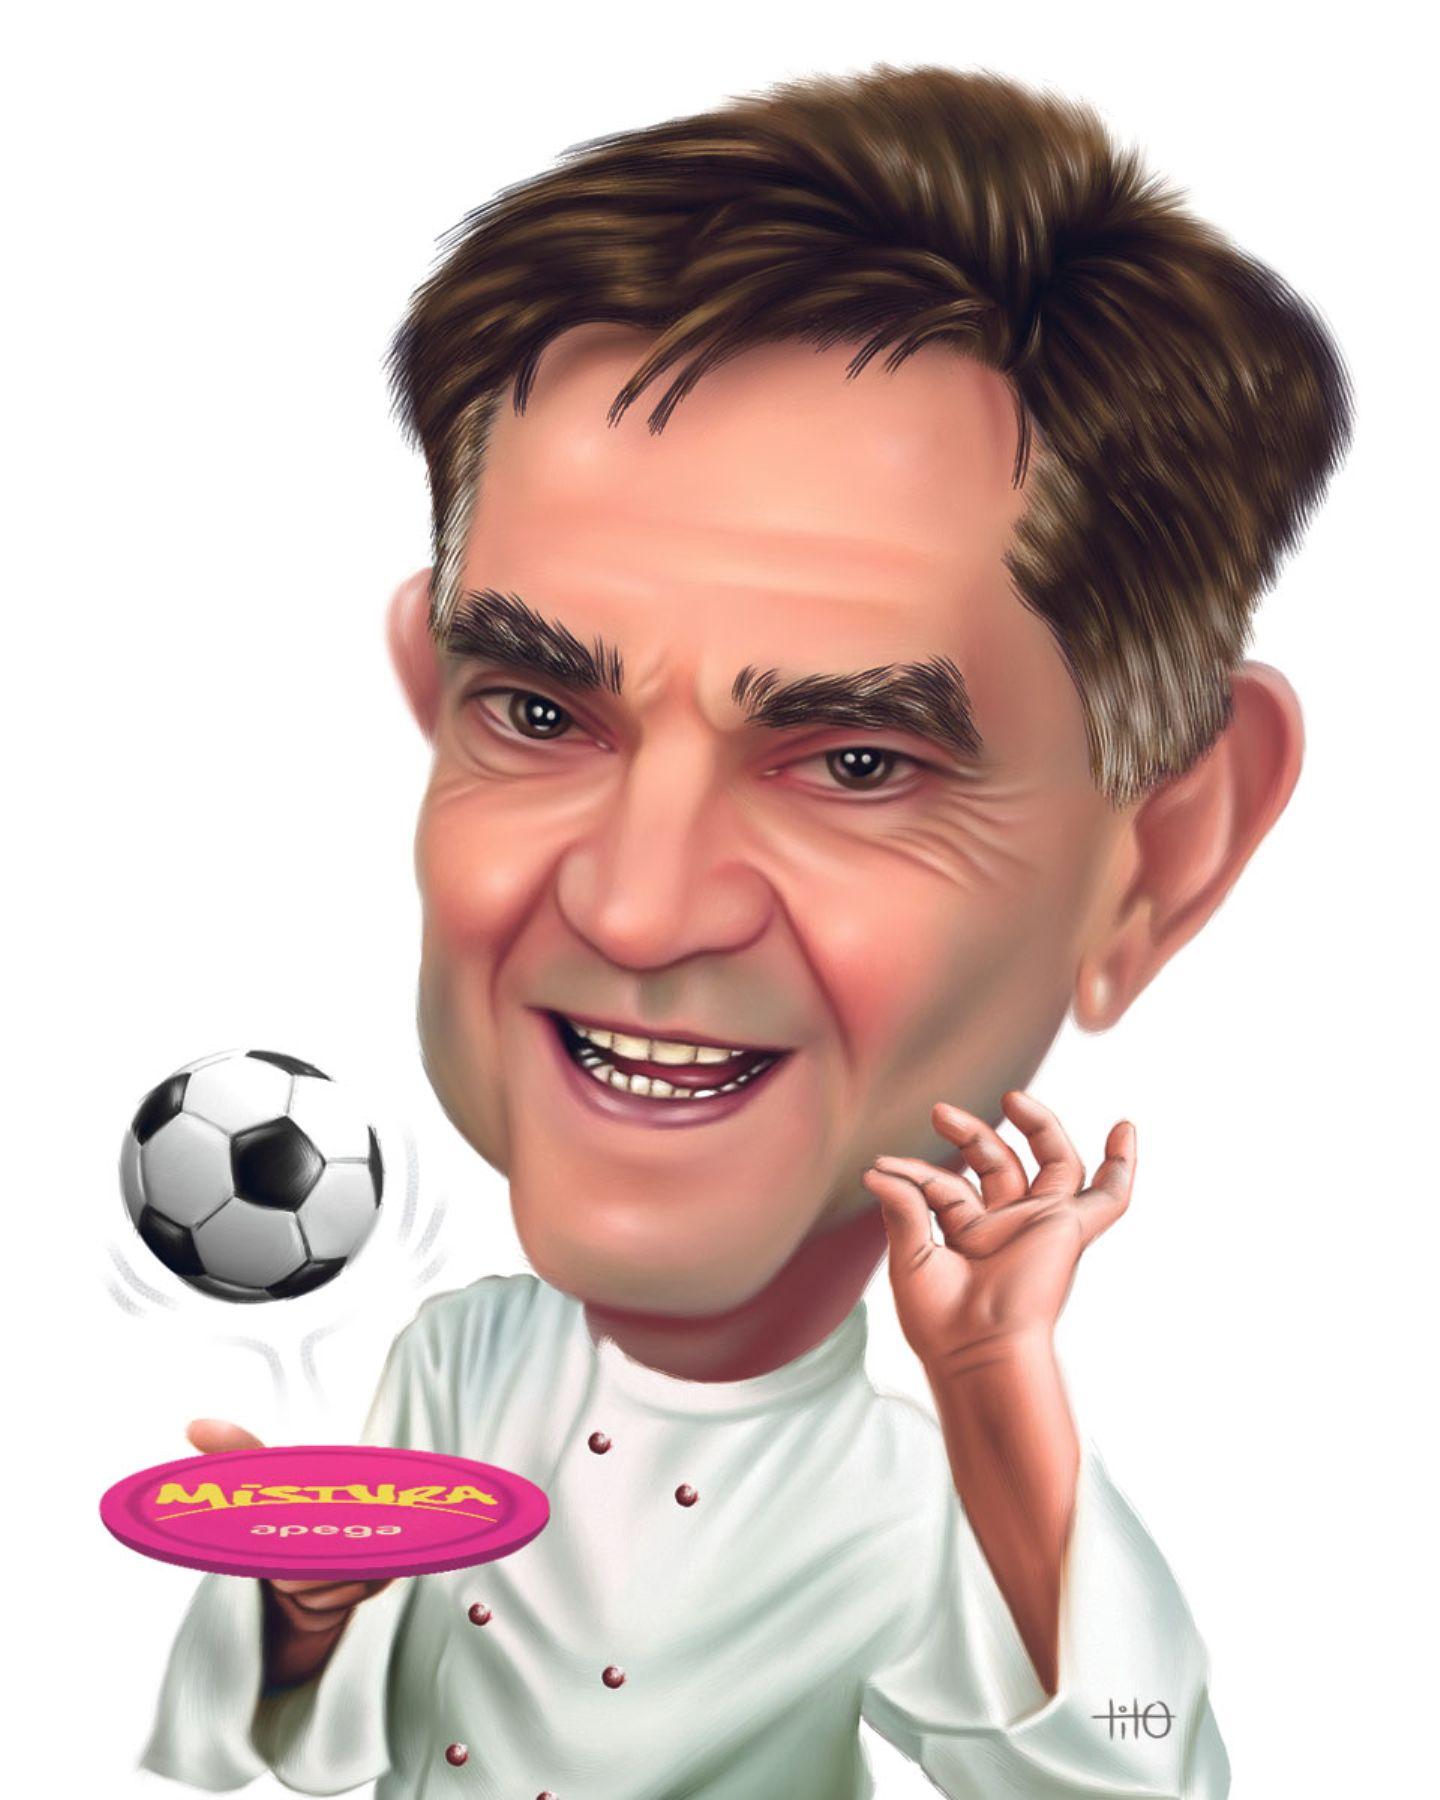 Mariano Valderrama. Caricatura: Tito Piqué